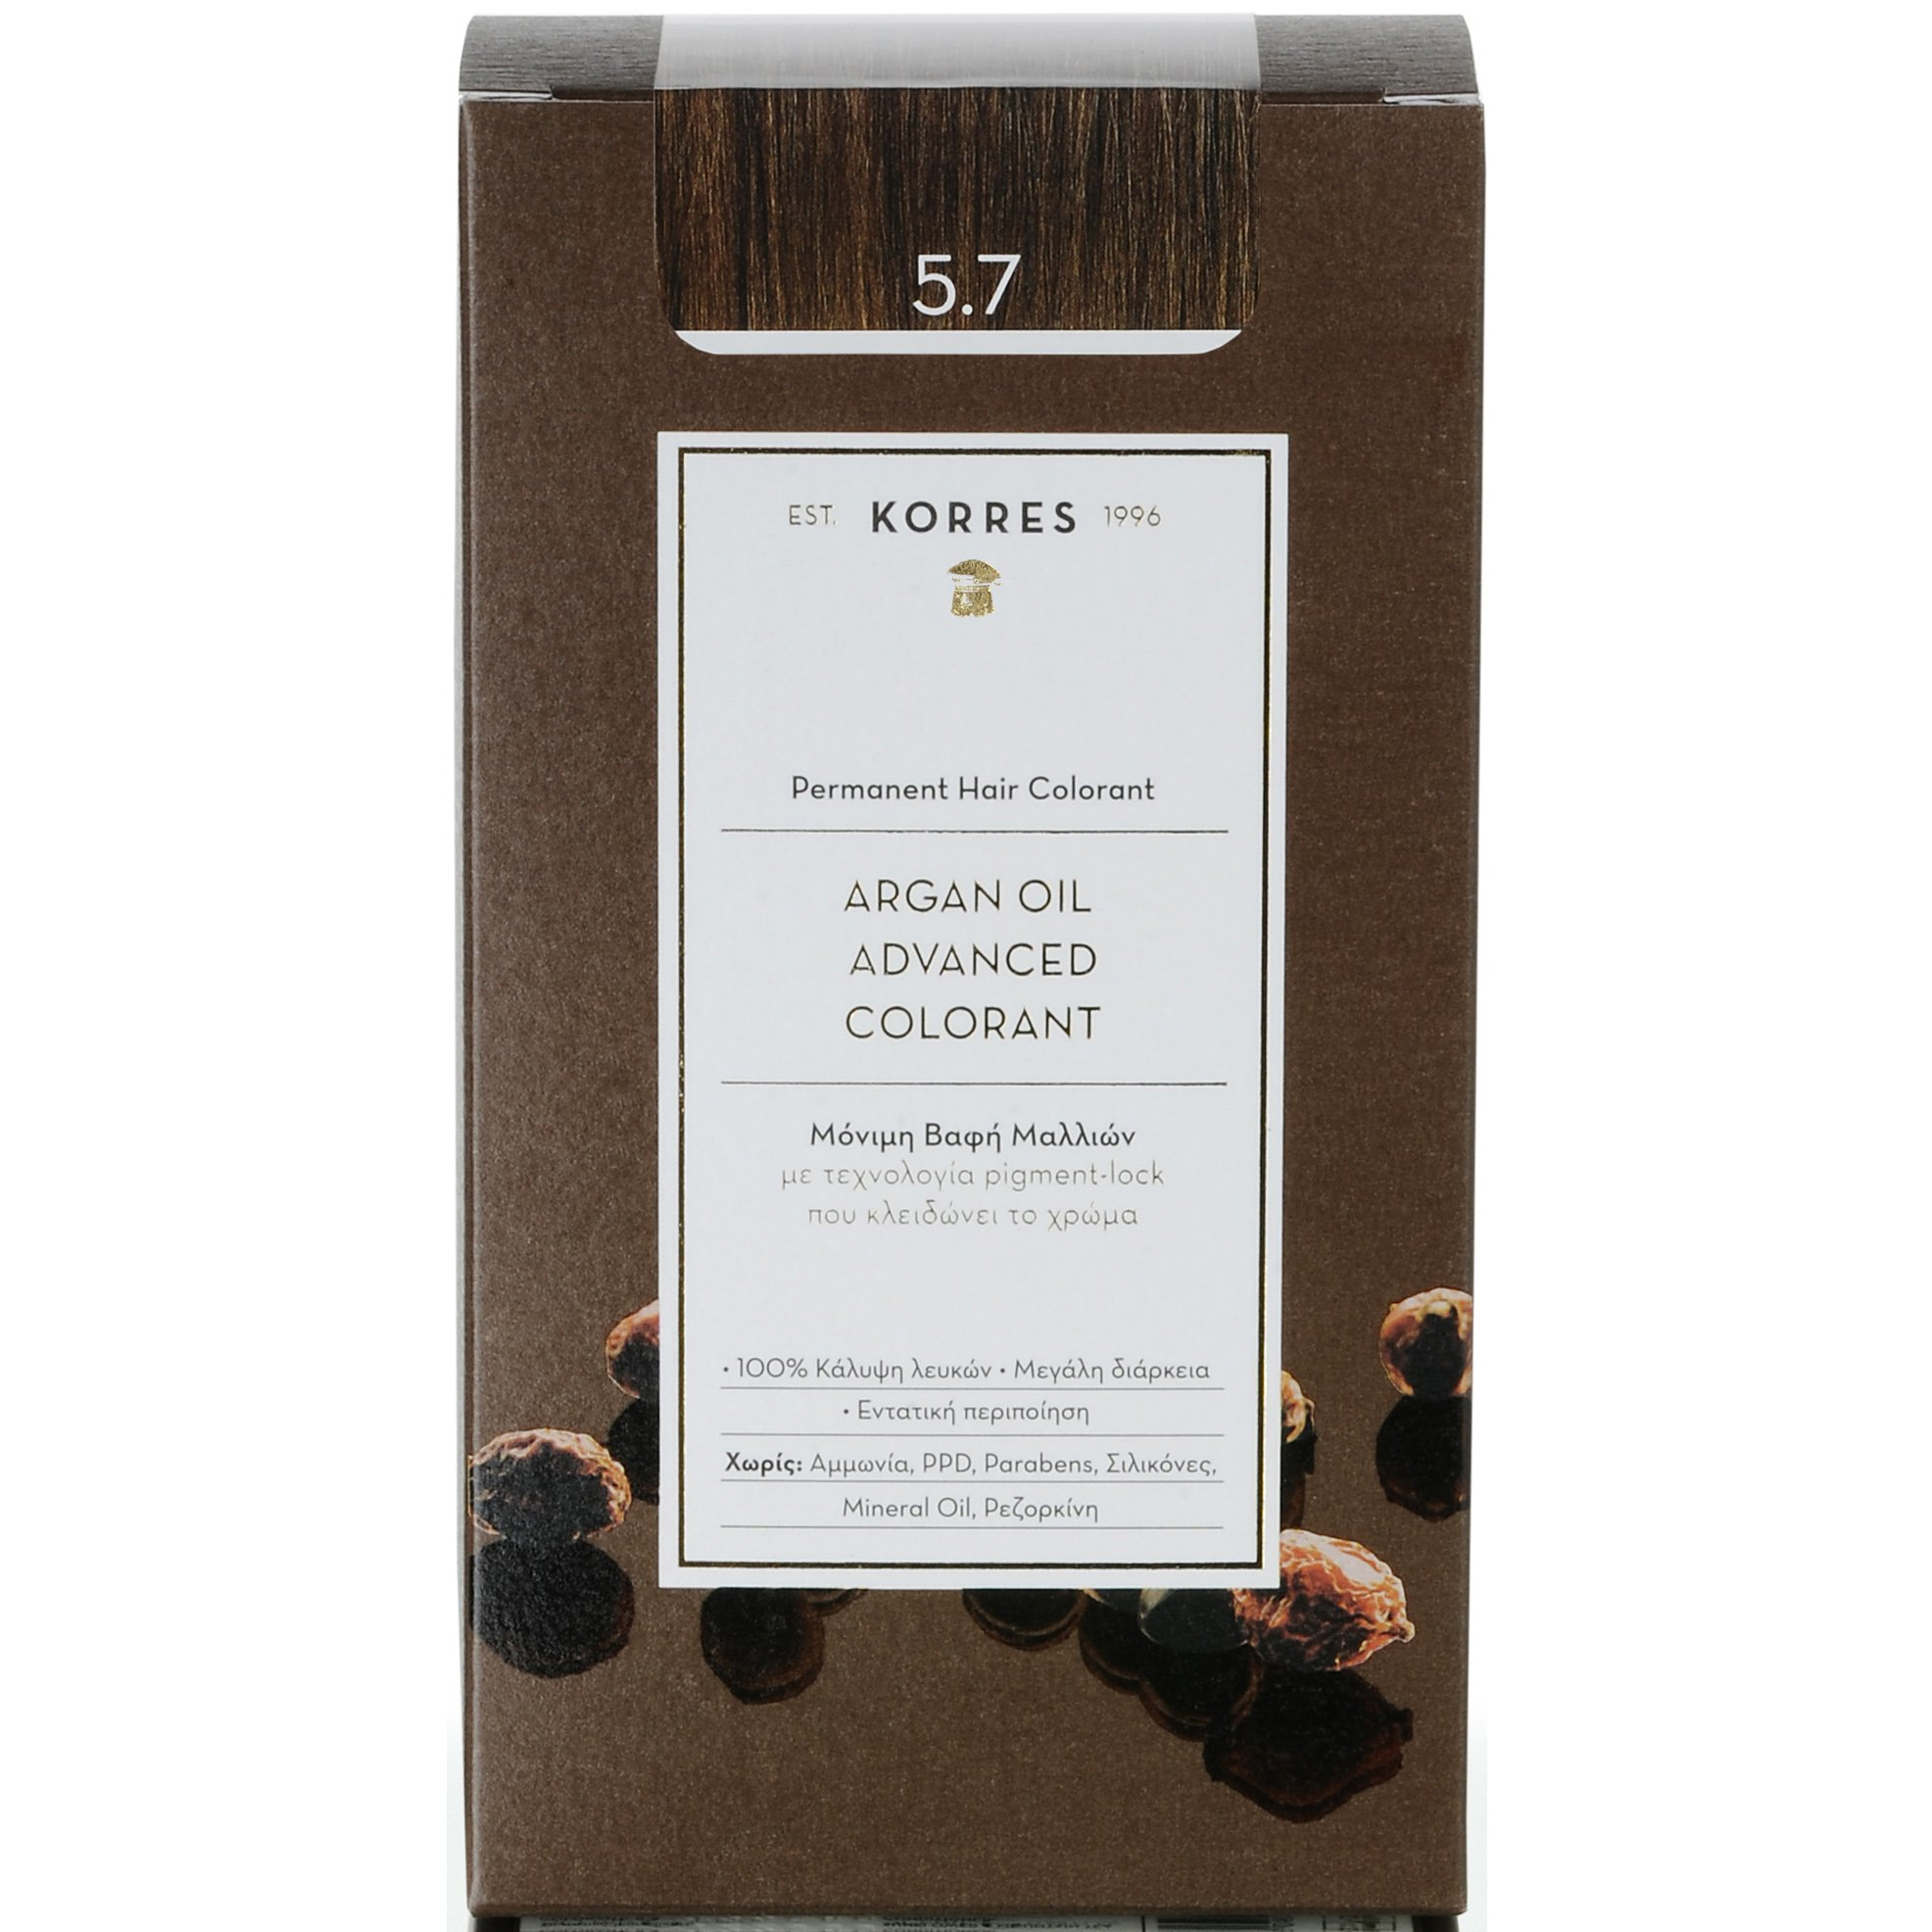 Korres Argan Oil Advanced Colorant Μόνιμη Βαφή Μαλλιών με Τεχνολογία Pigment-Lock που Κλειδώνει το Χρώμα 50ml – 5.7 ΣΟΚΟΛΑΤΙ